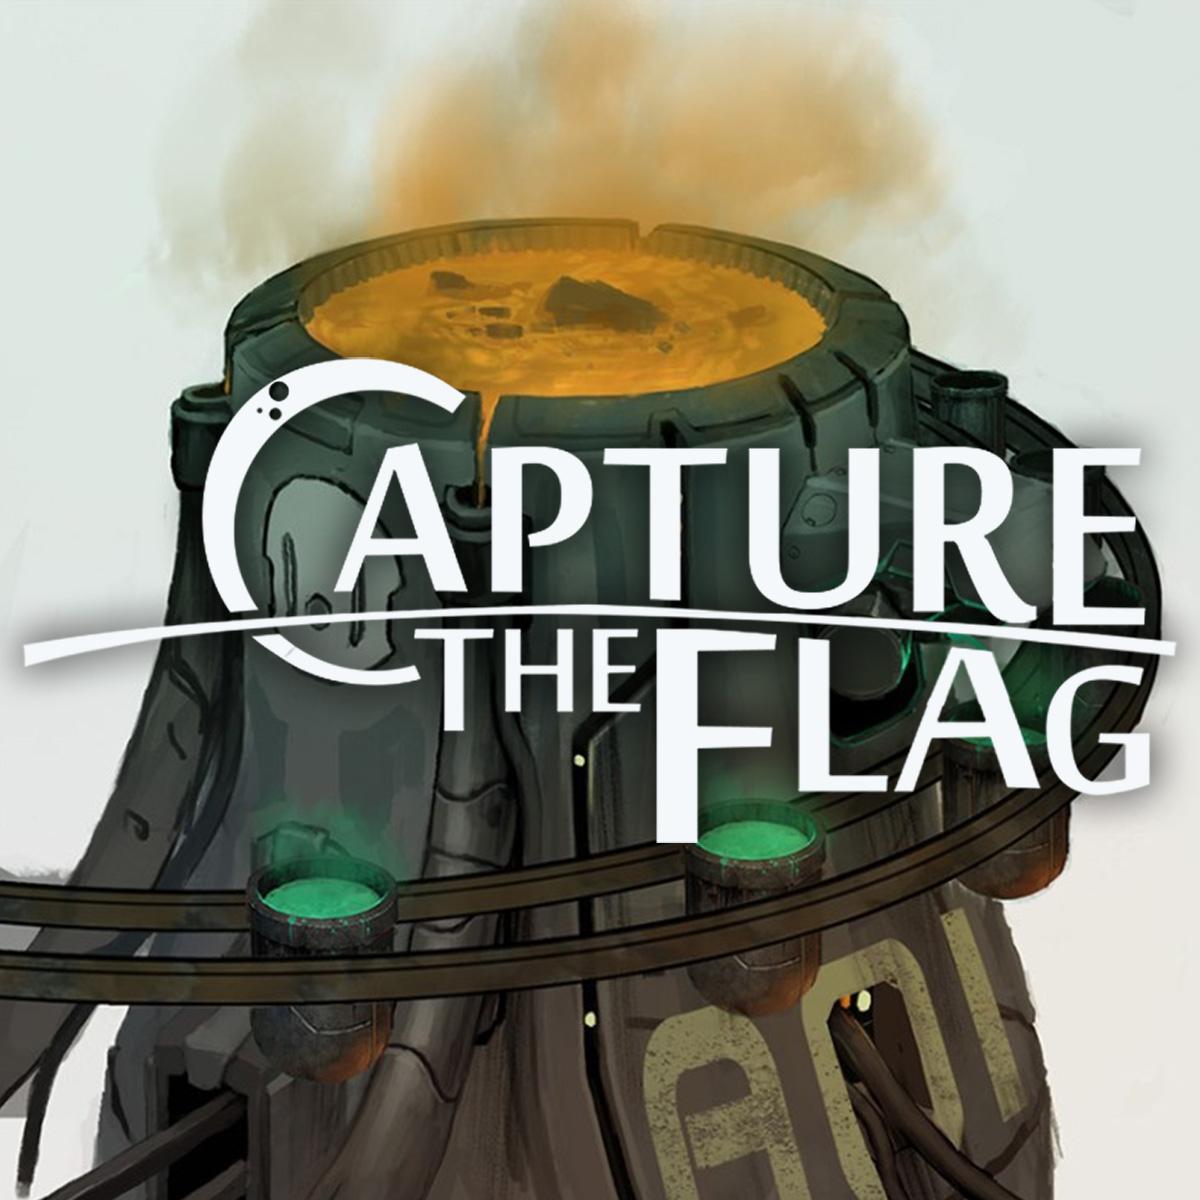 Capture The Flag Production